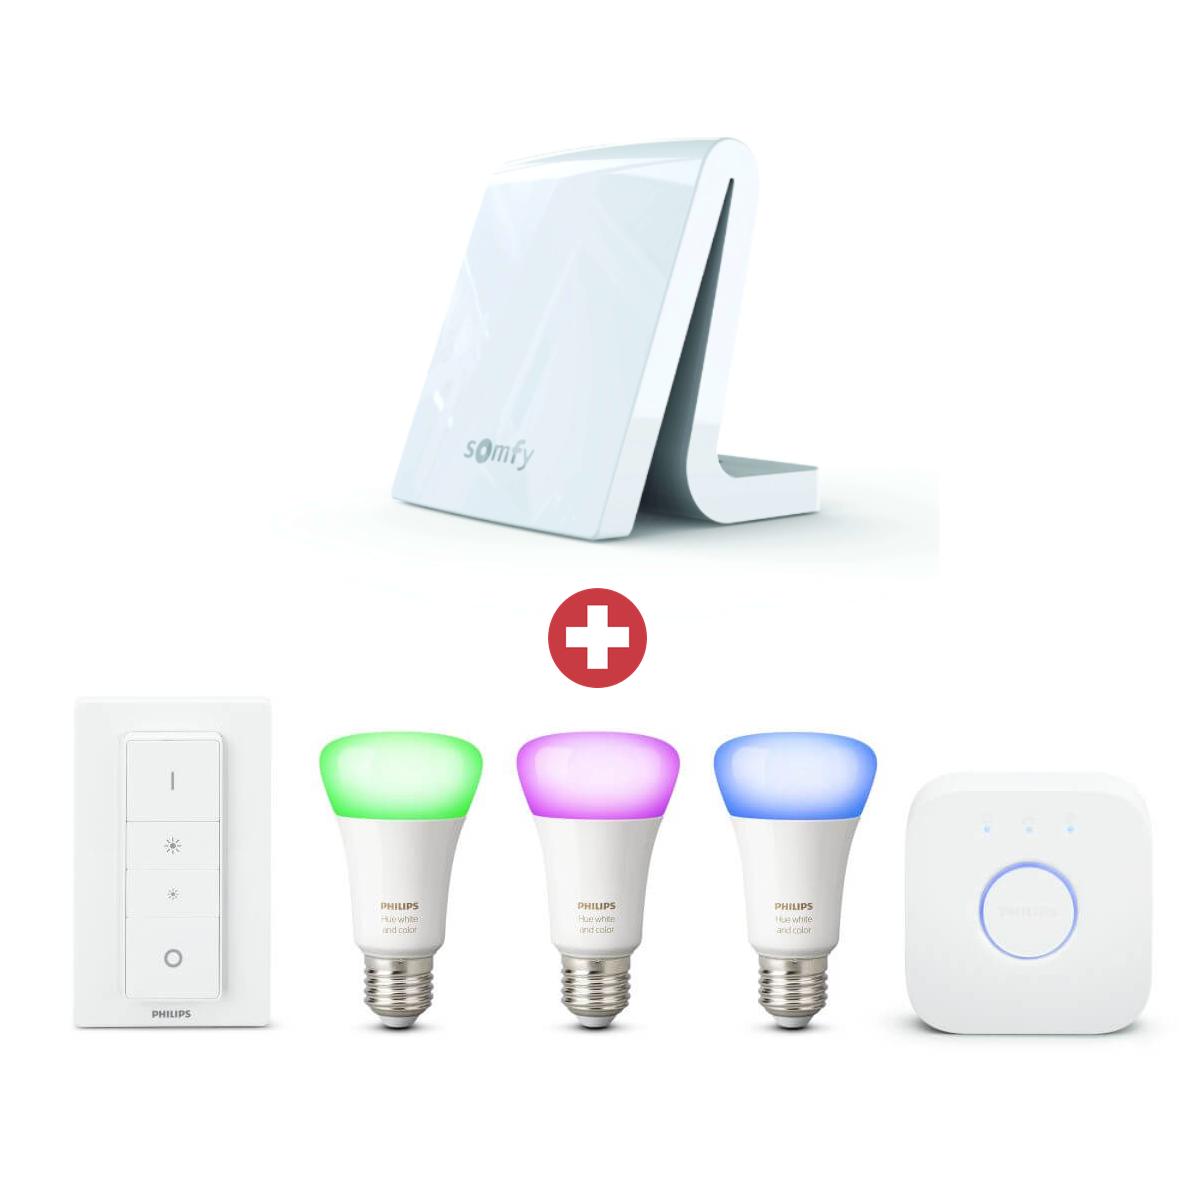 Somfy Vorteilspaket TaHoma Premium + Philips Hue LED E27 3er Starter Set RGBW 10 Watt